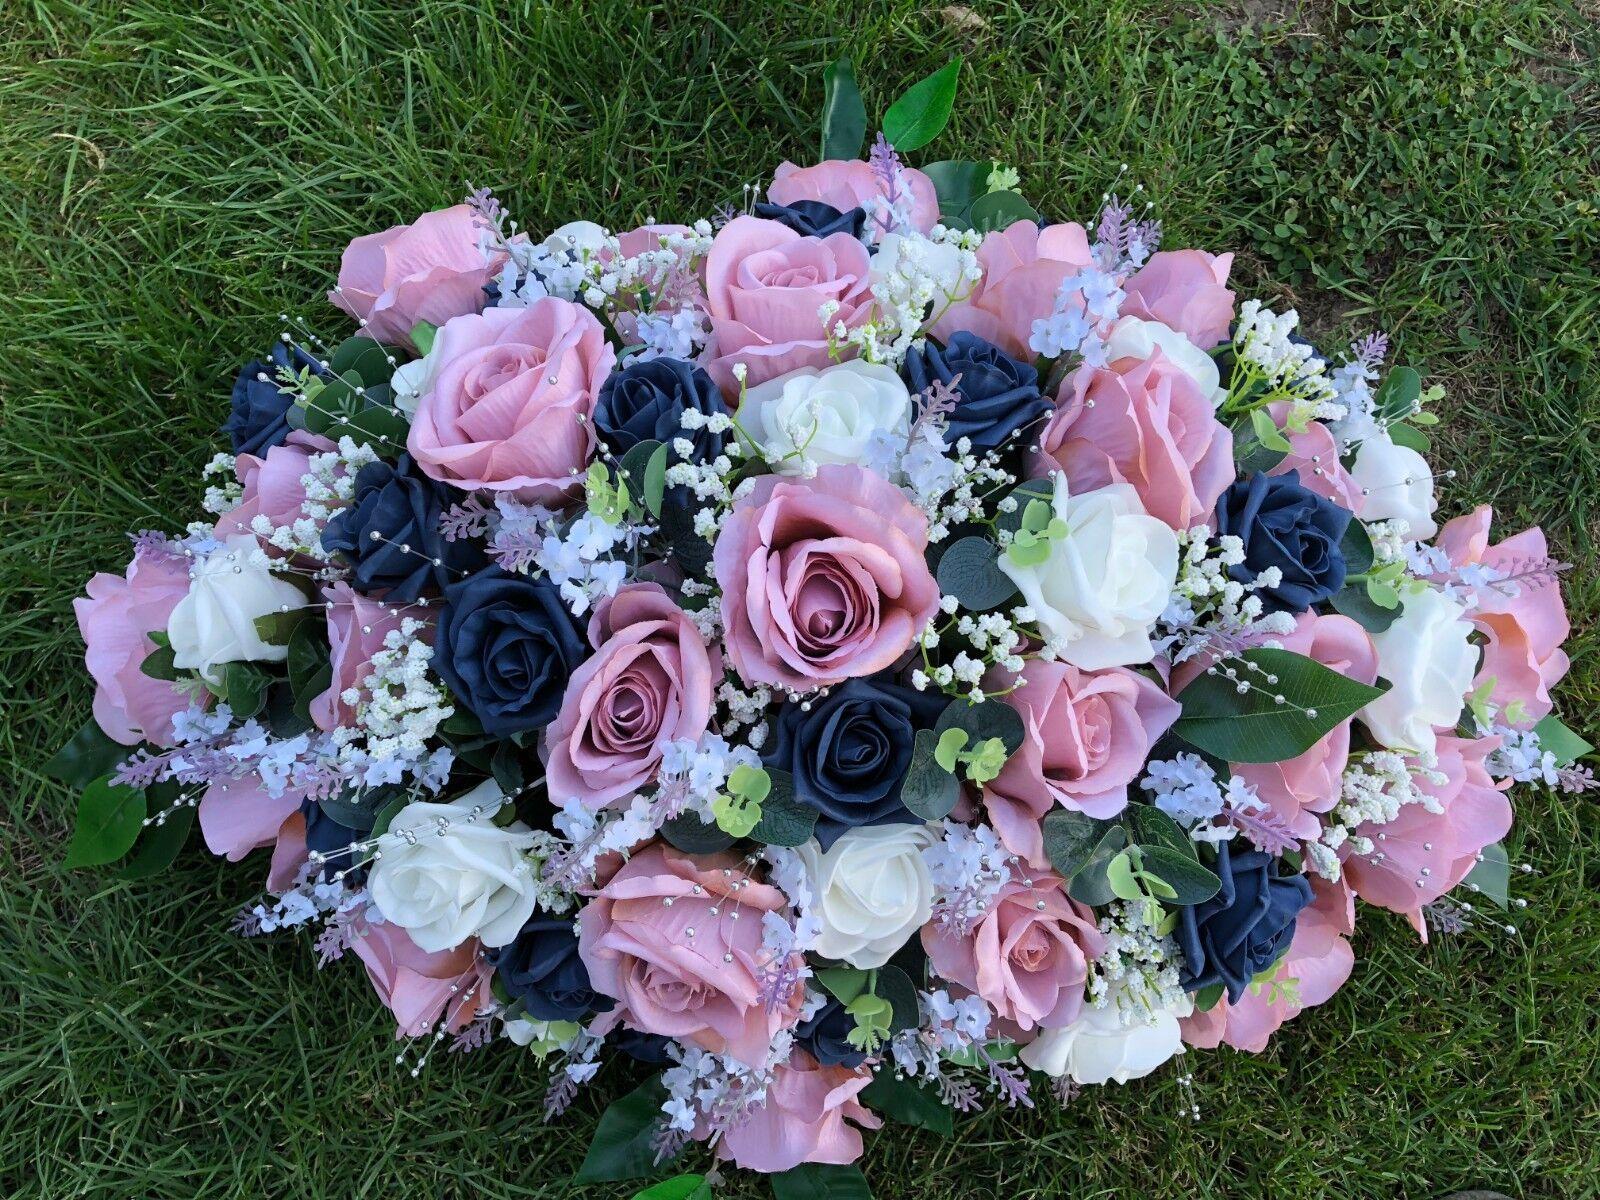 Grand arrangeHommes Mariage Fleurs Table Top arrangeHommes Grand t MINK PINK ROSES bleu marine & blanc ec93d6